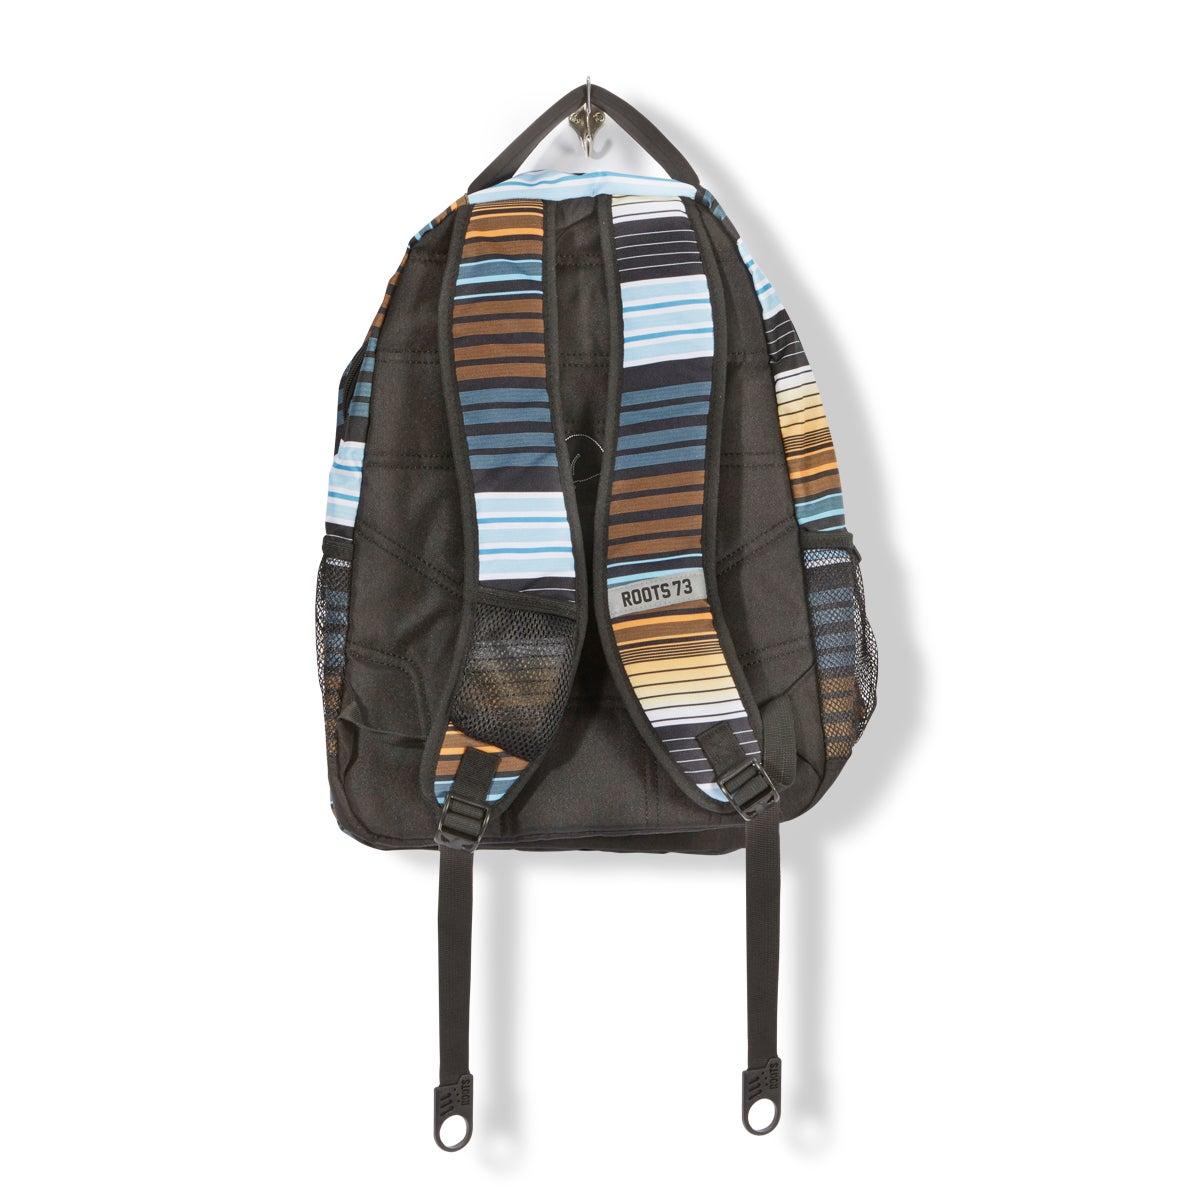 Unisex Roots73 blk/org stripe backpack